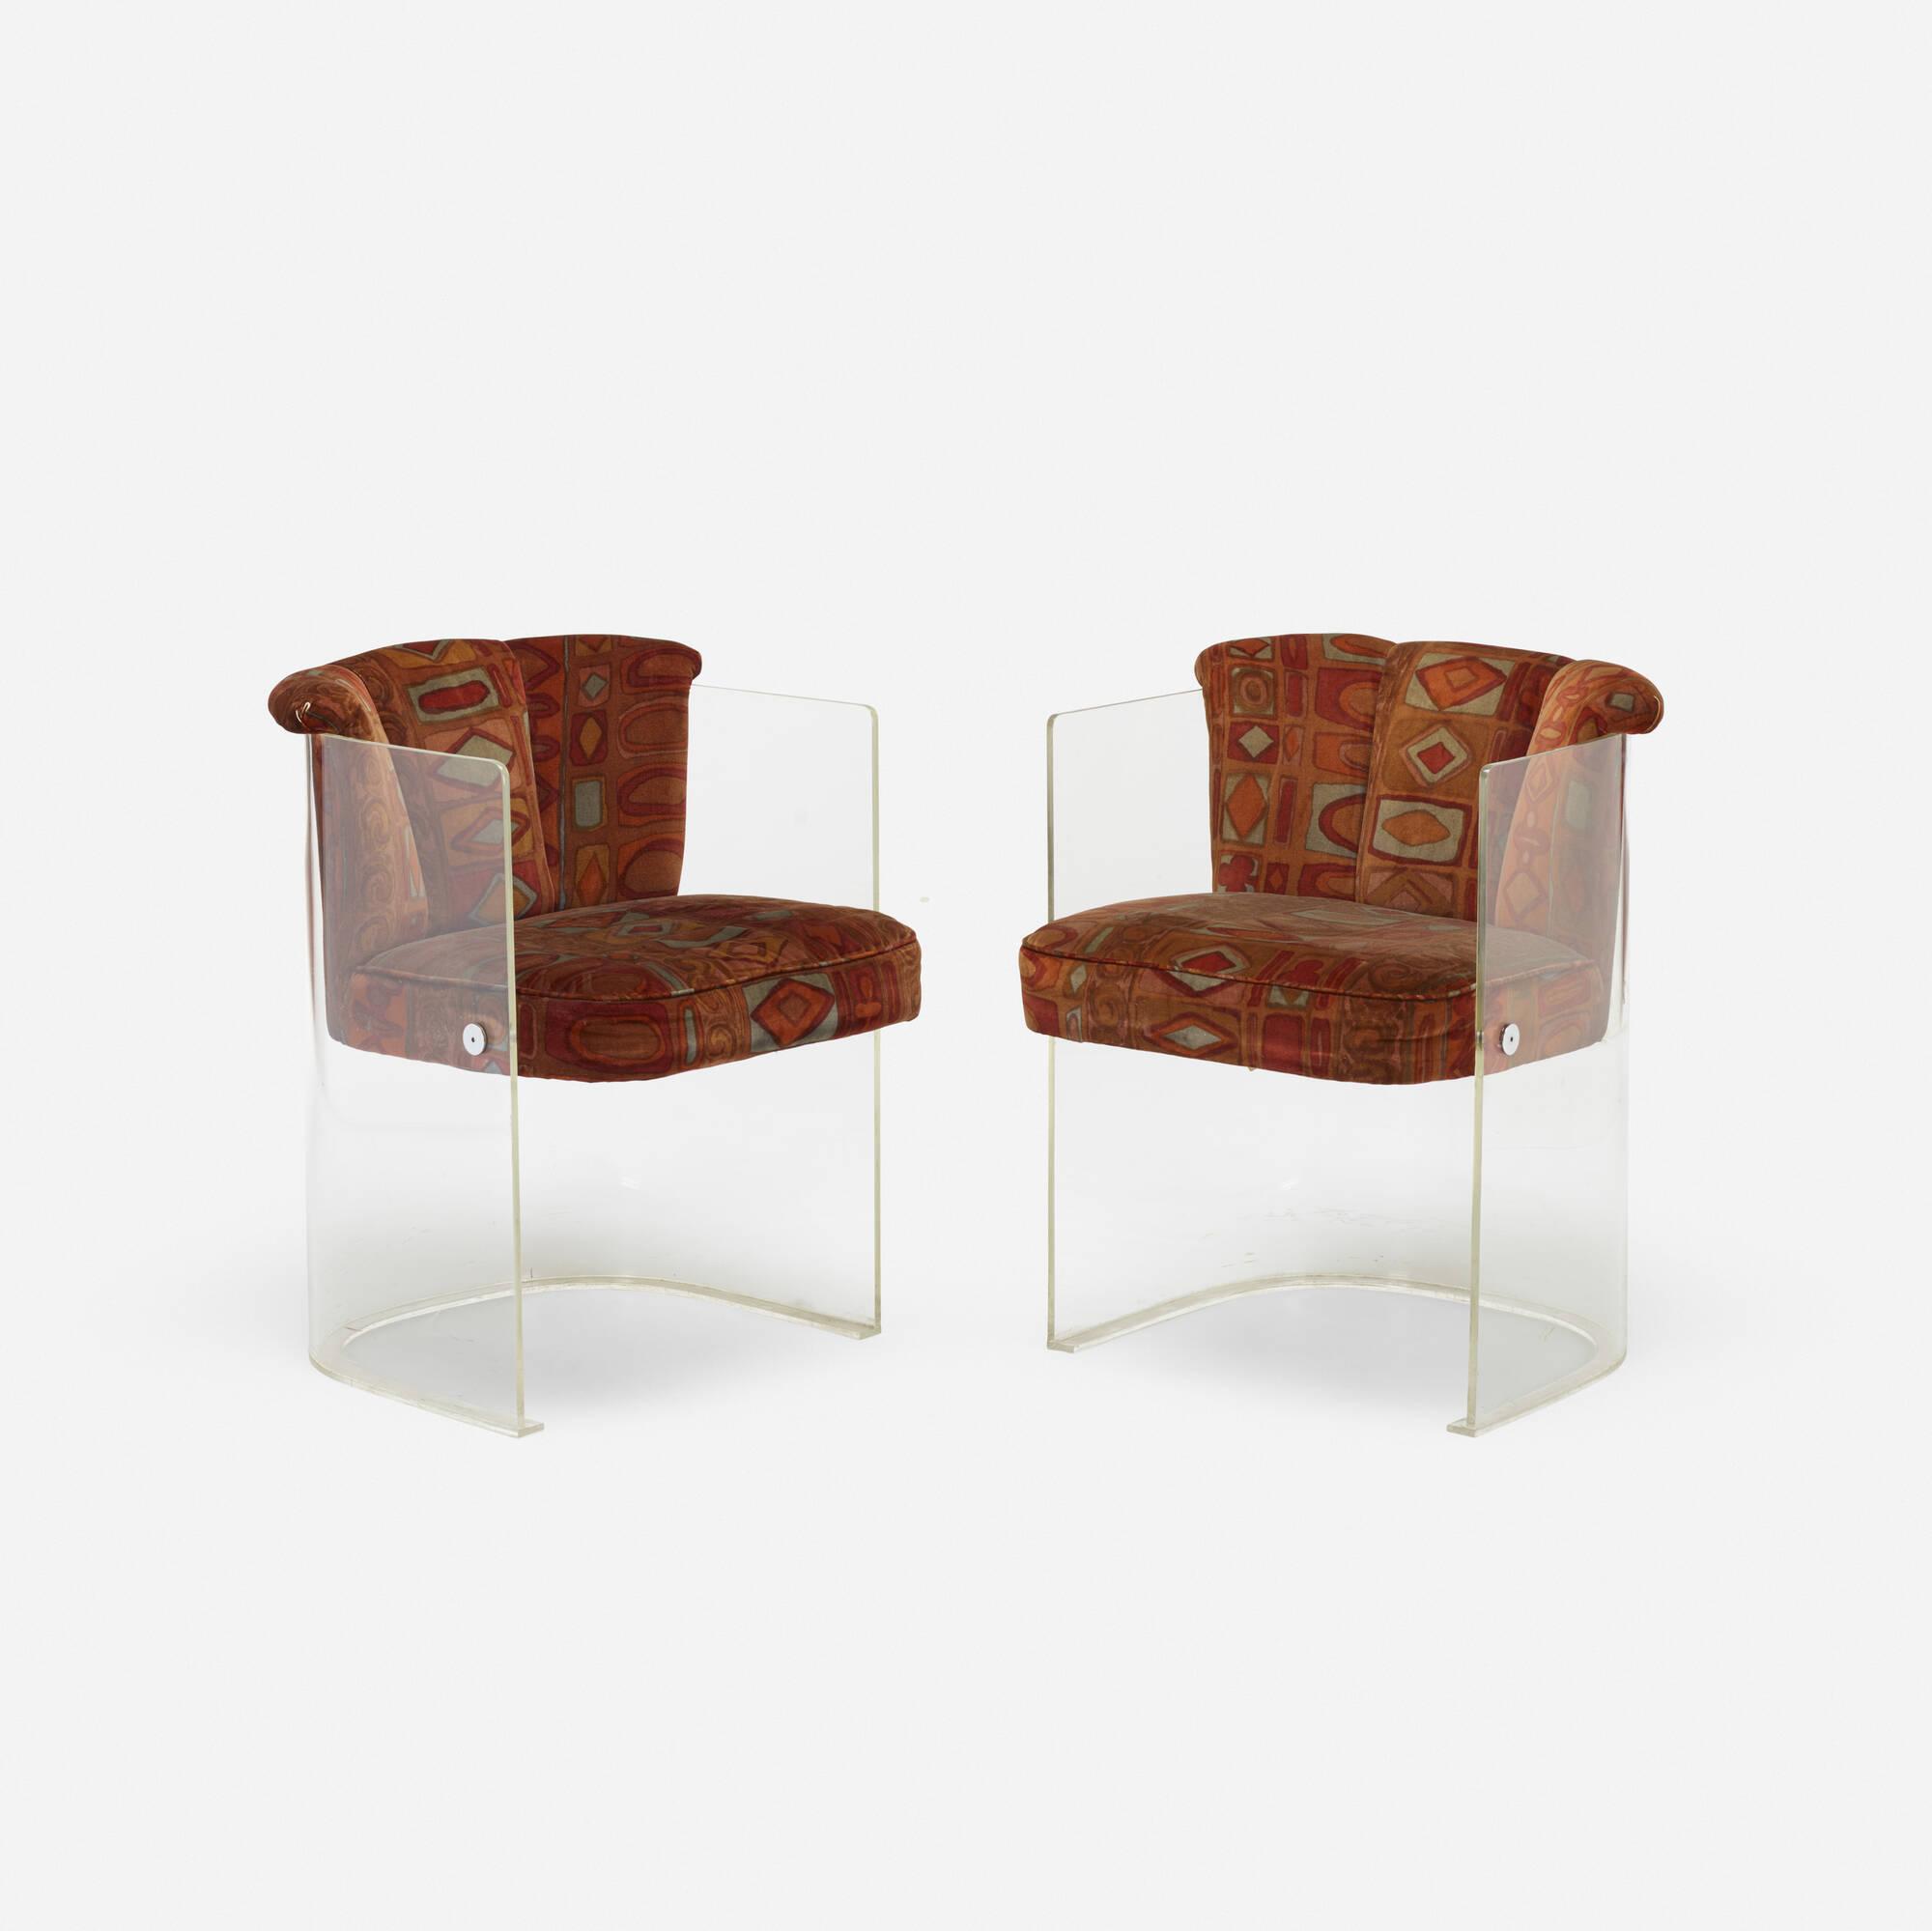 208: Vladimir Kagan / chairs model 6700, pair (1 of 3)